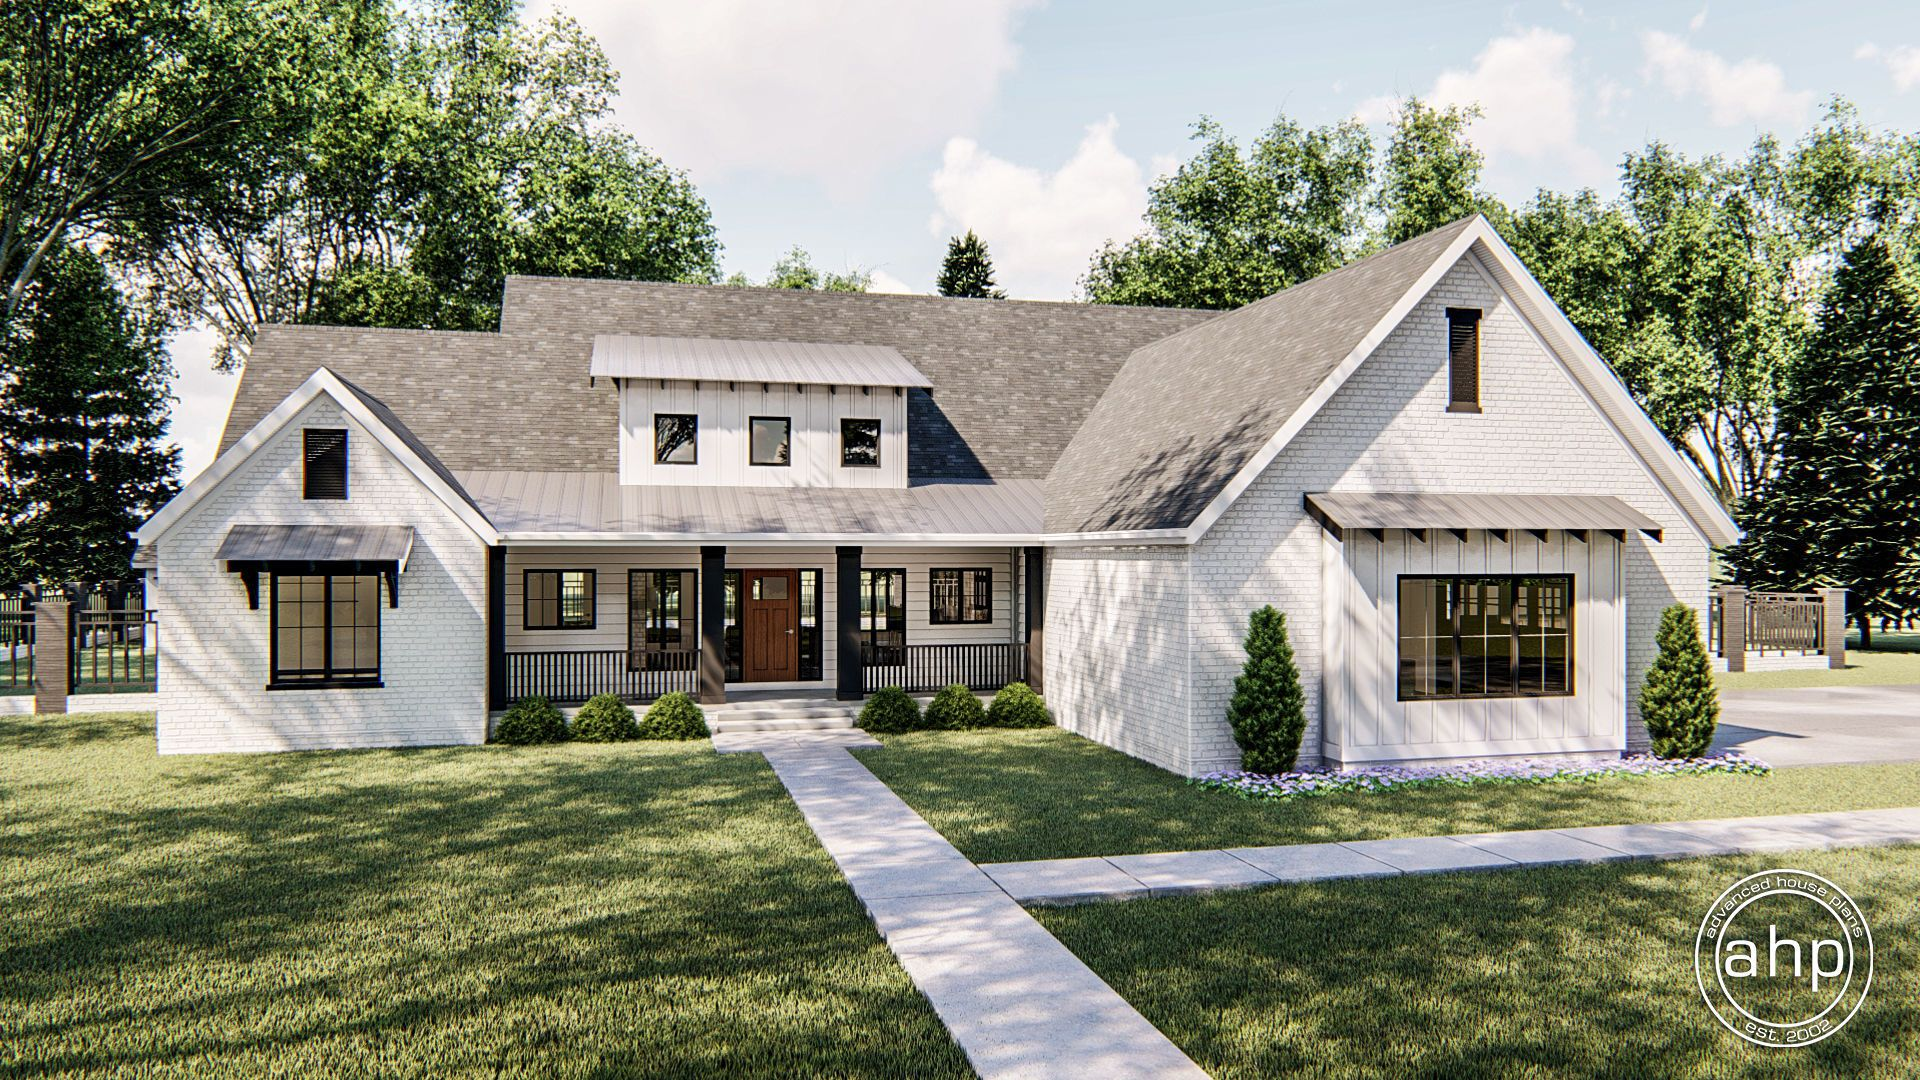 Vandyke 1 Story Modern Farmhouse House Plan Brick ranch